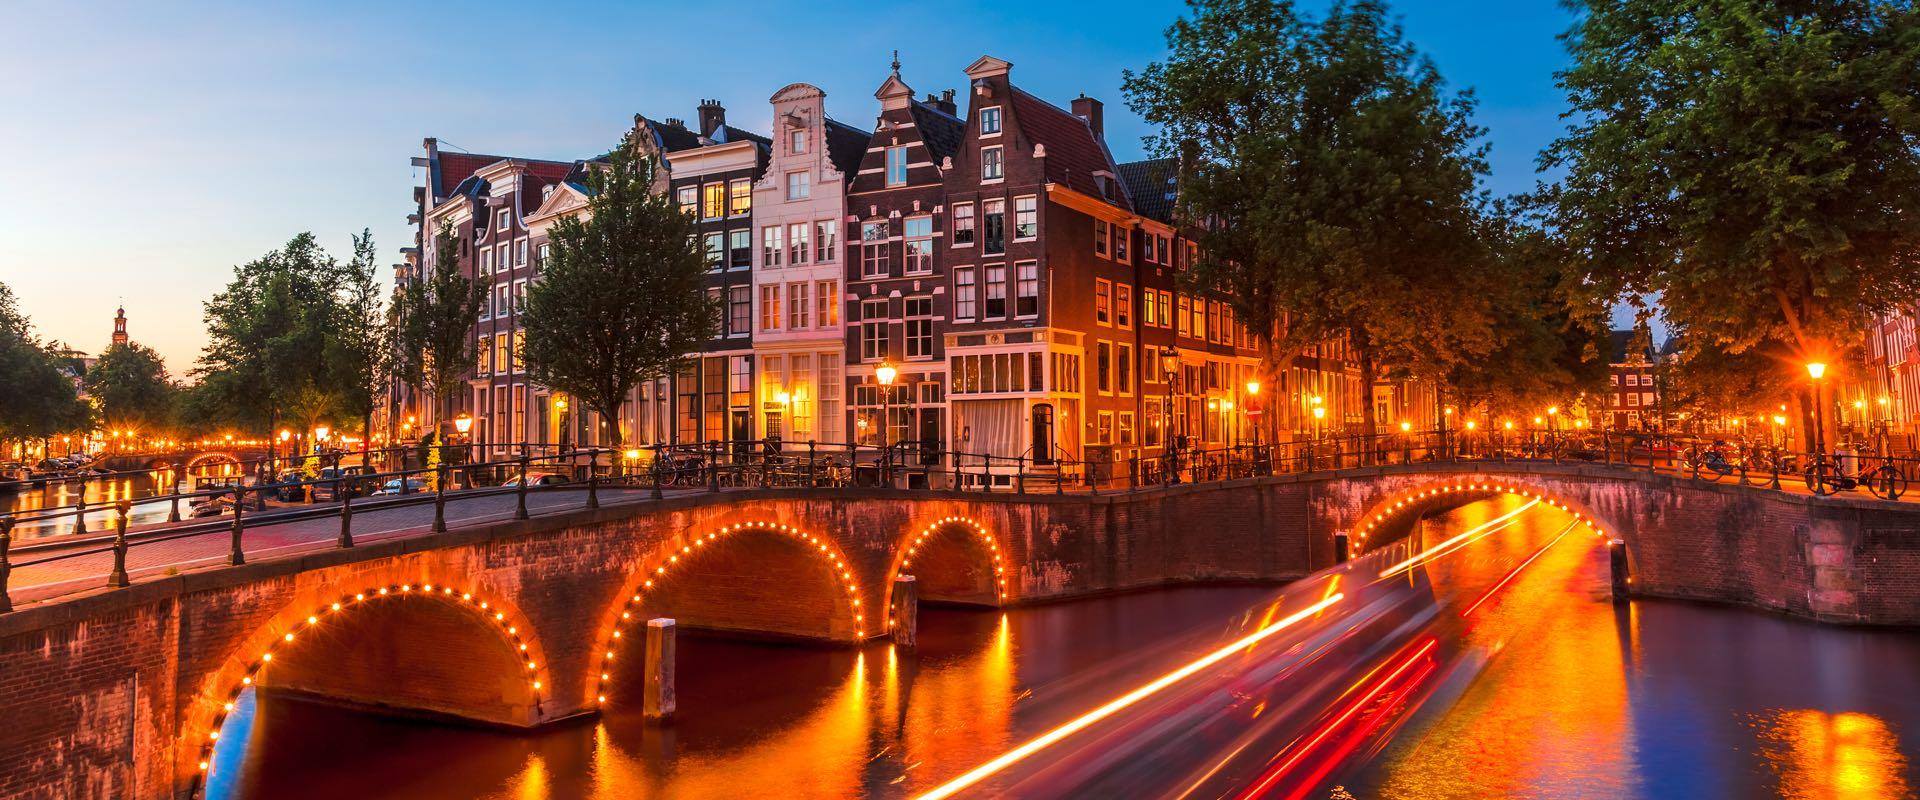 amsterdam_1920x800.jpg